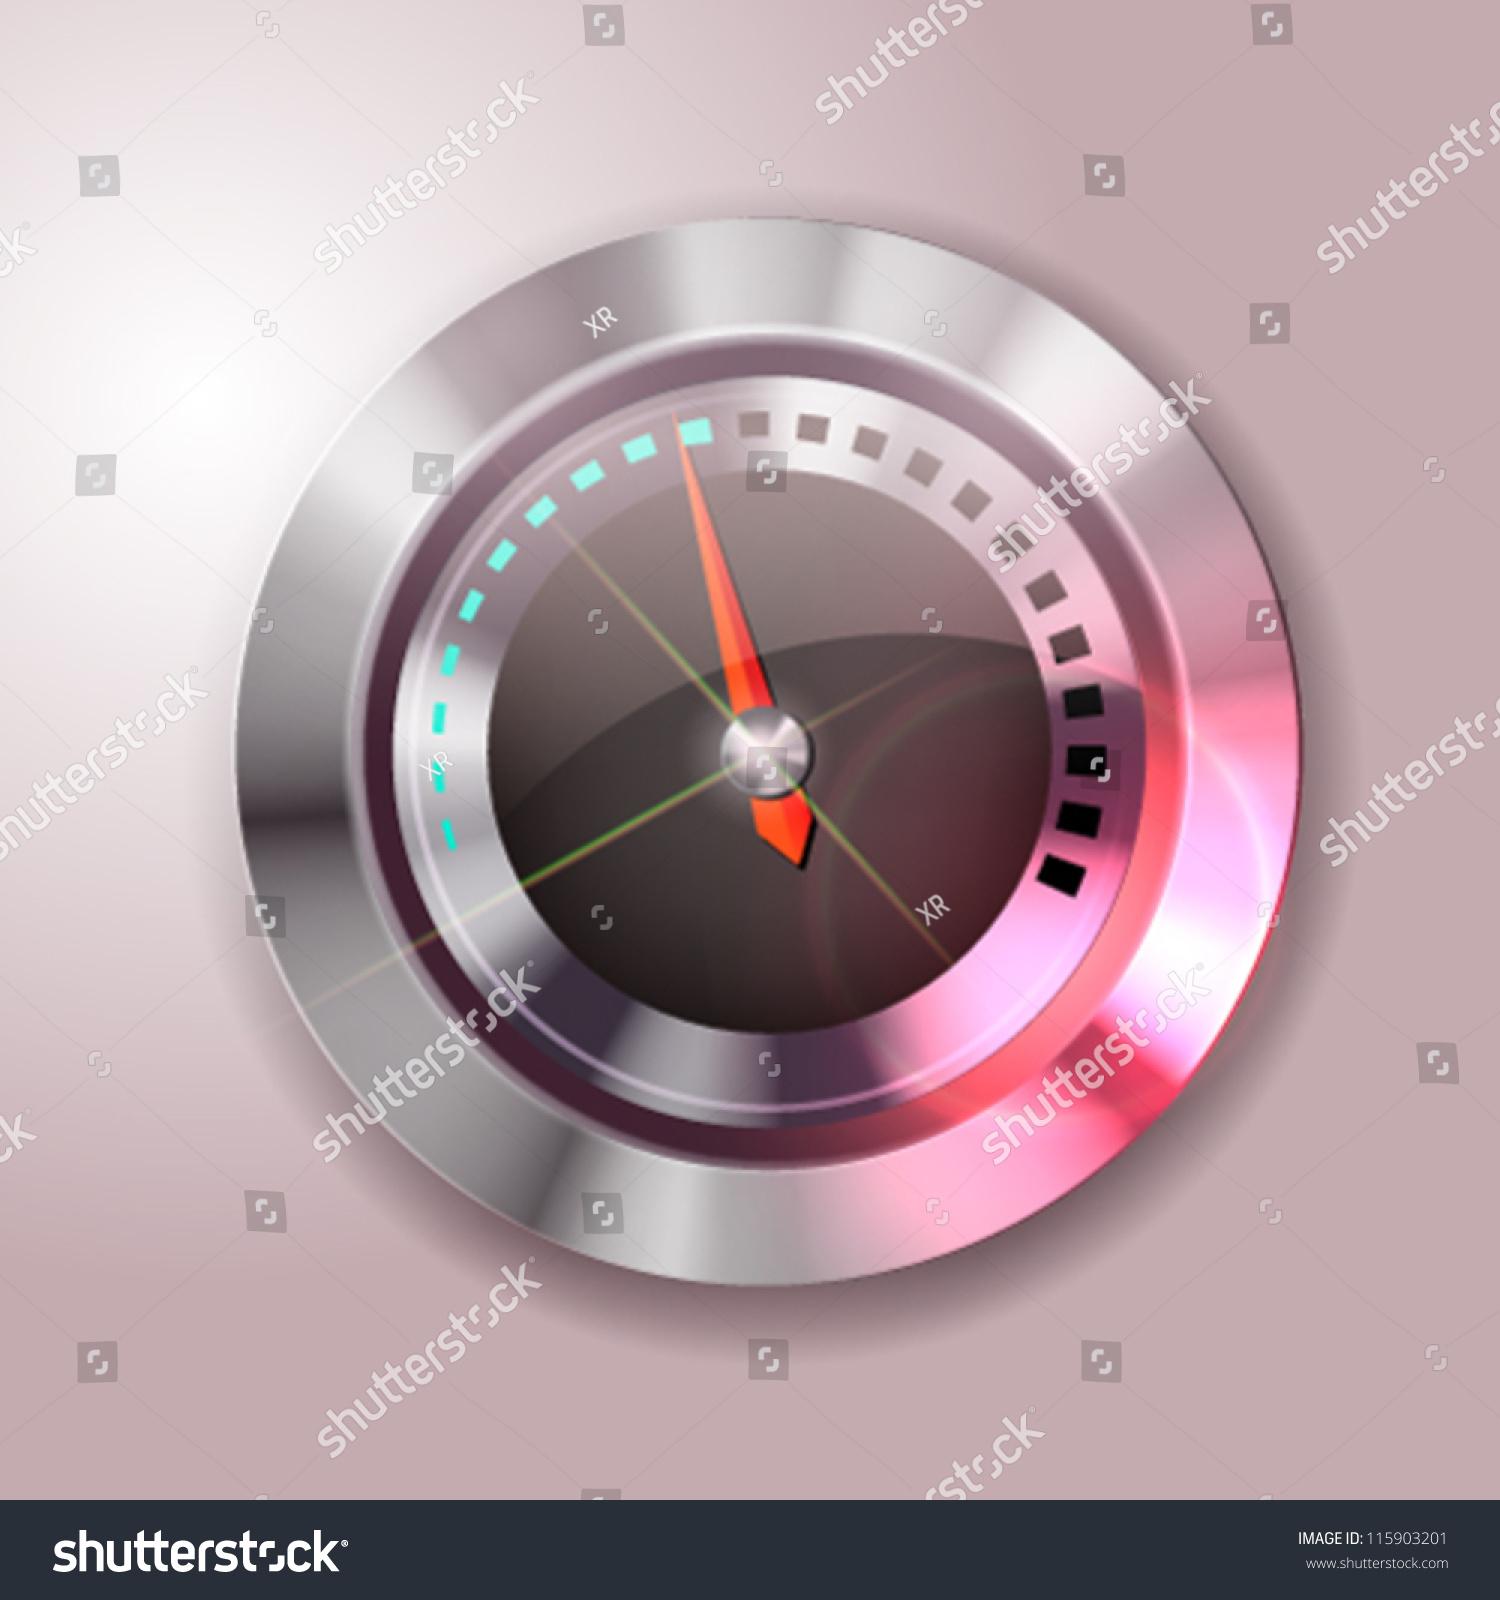 Futuristic Clock Retrofuturistic Analog Clock Design Useful Banners Stock Vector